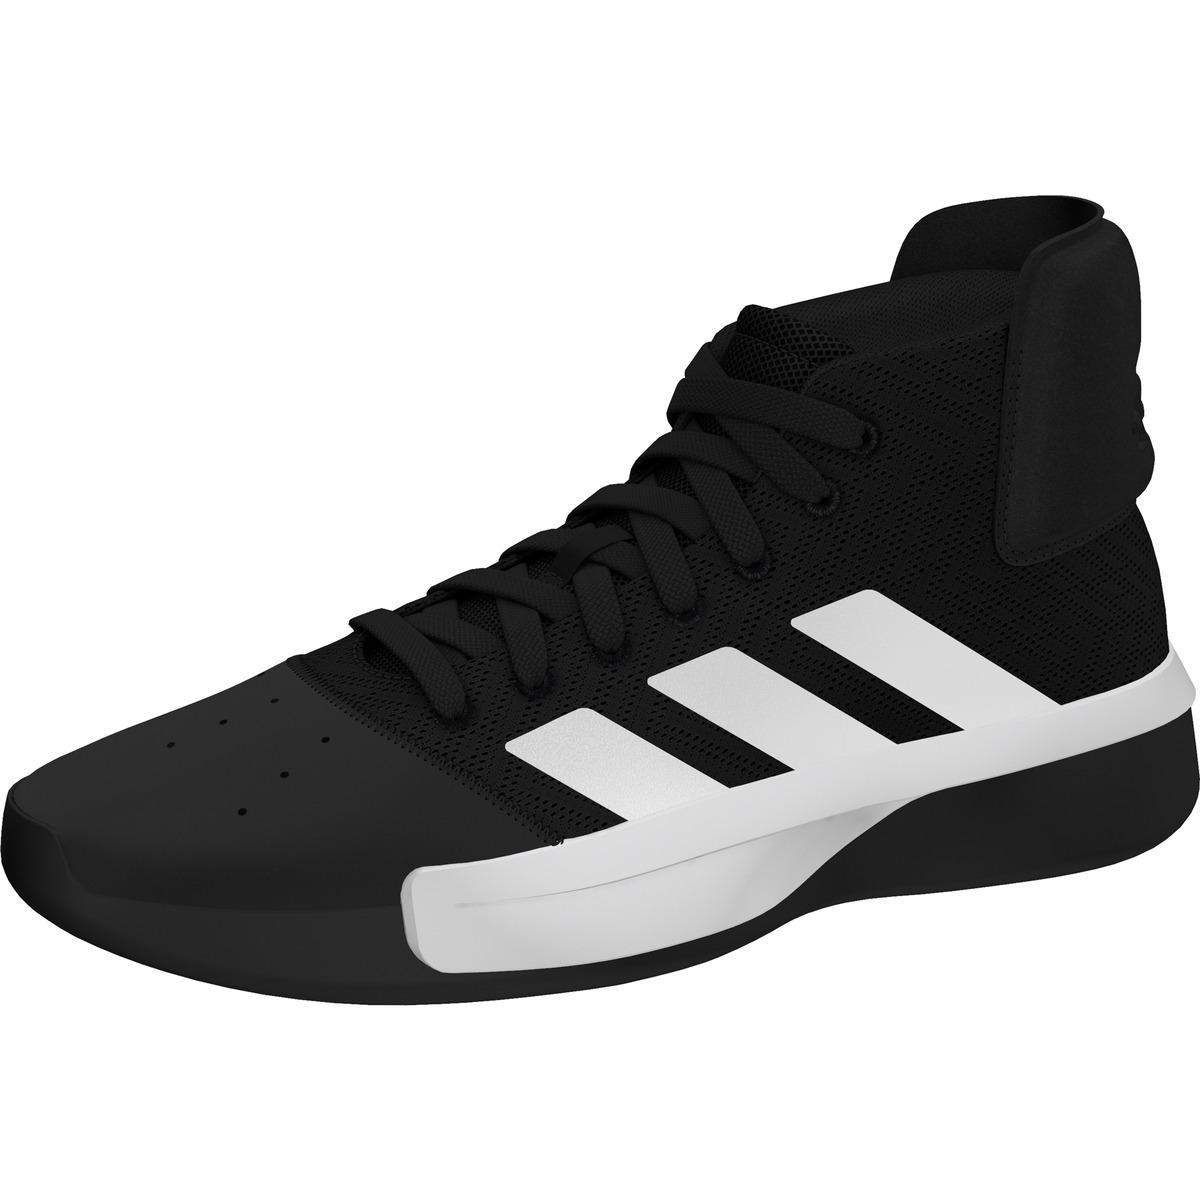 premium selection da3db 26e54 Lyst - adidas Pro Adversary 2019 Basketball Boots in Black for Men